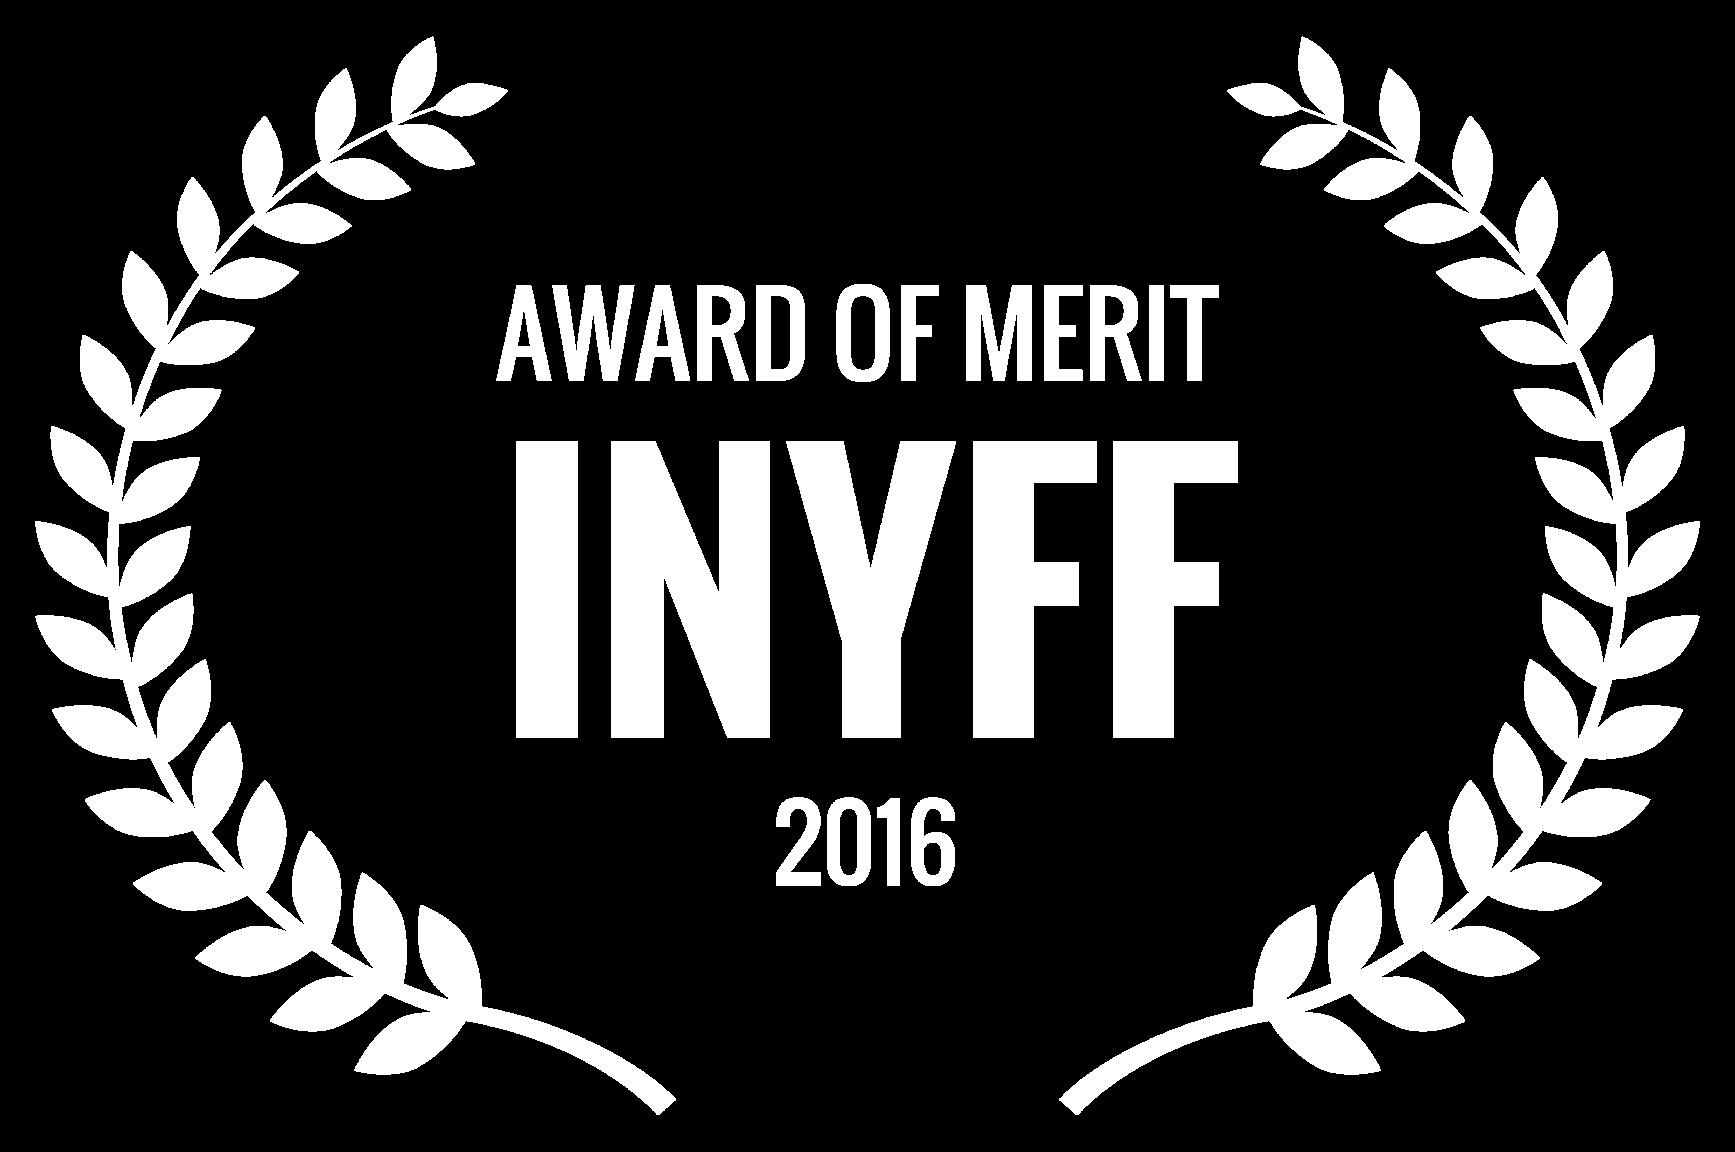 AWARD OF MERIT  - INYFF - 2016 (1).png